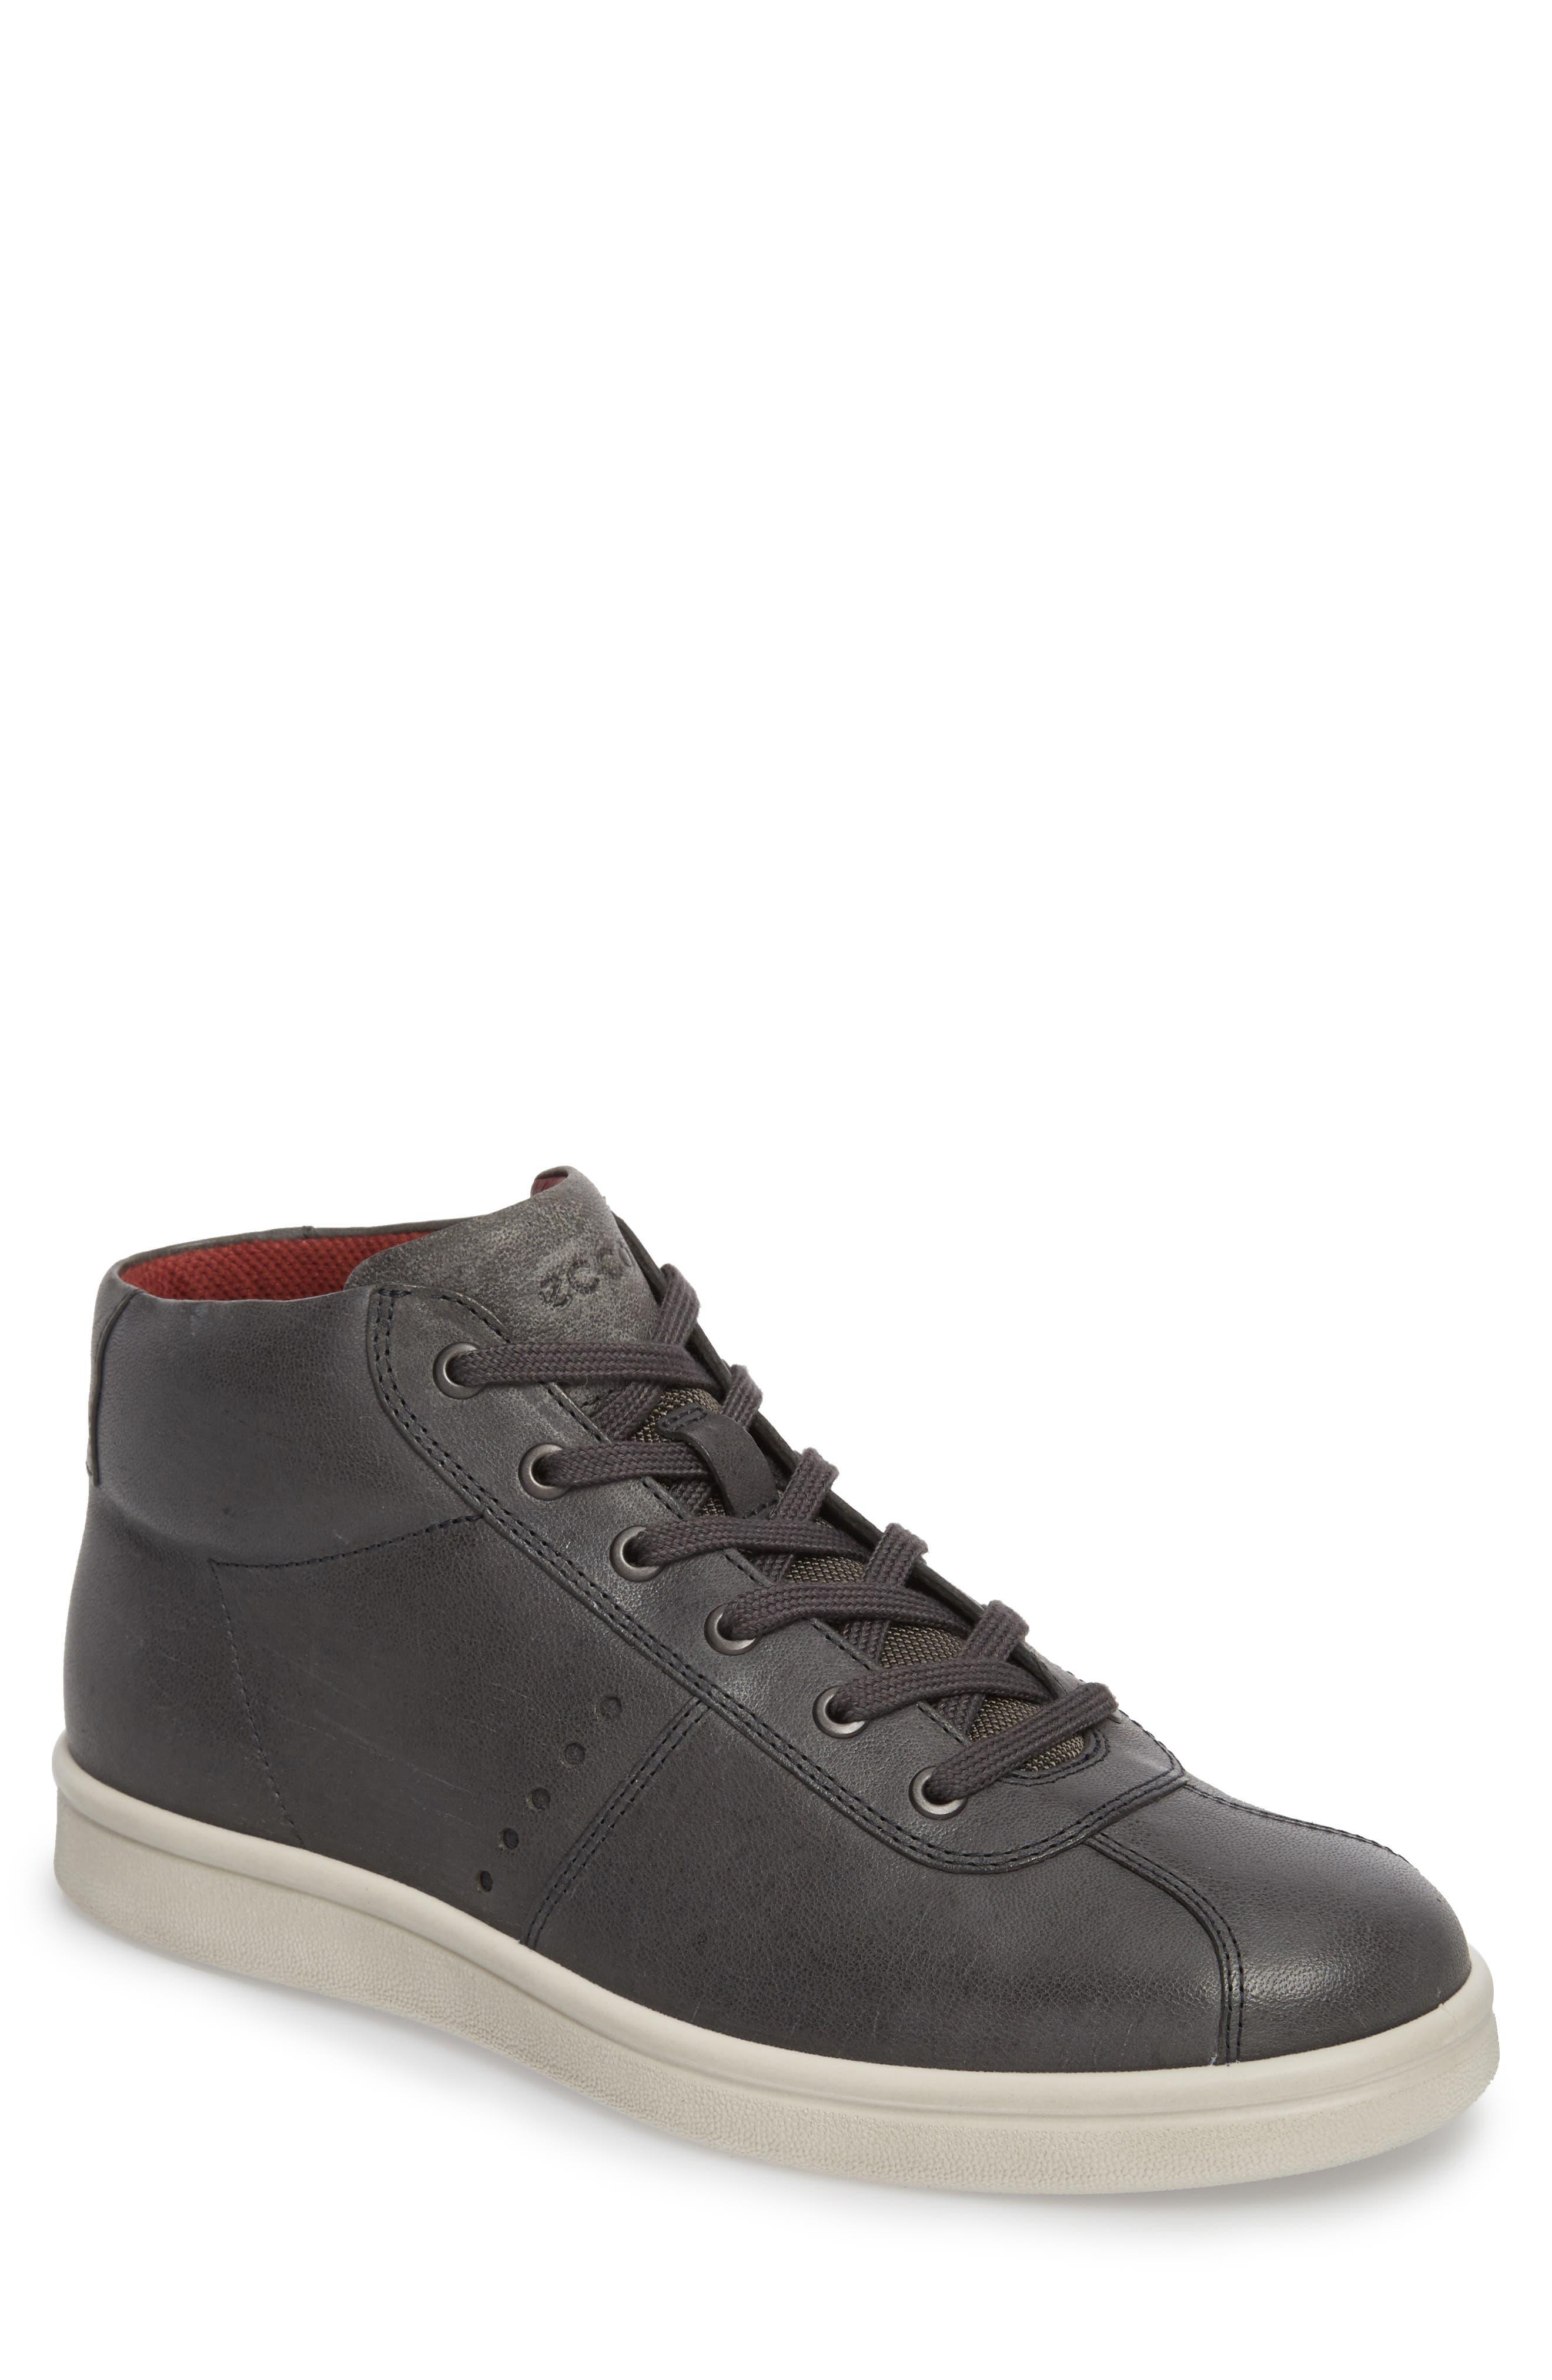 Kallum High Top Sneaker,                         Main,                         color, 078